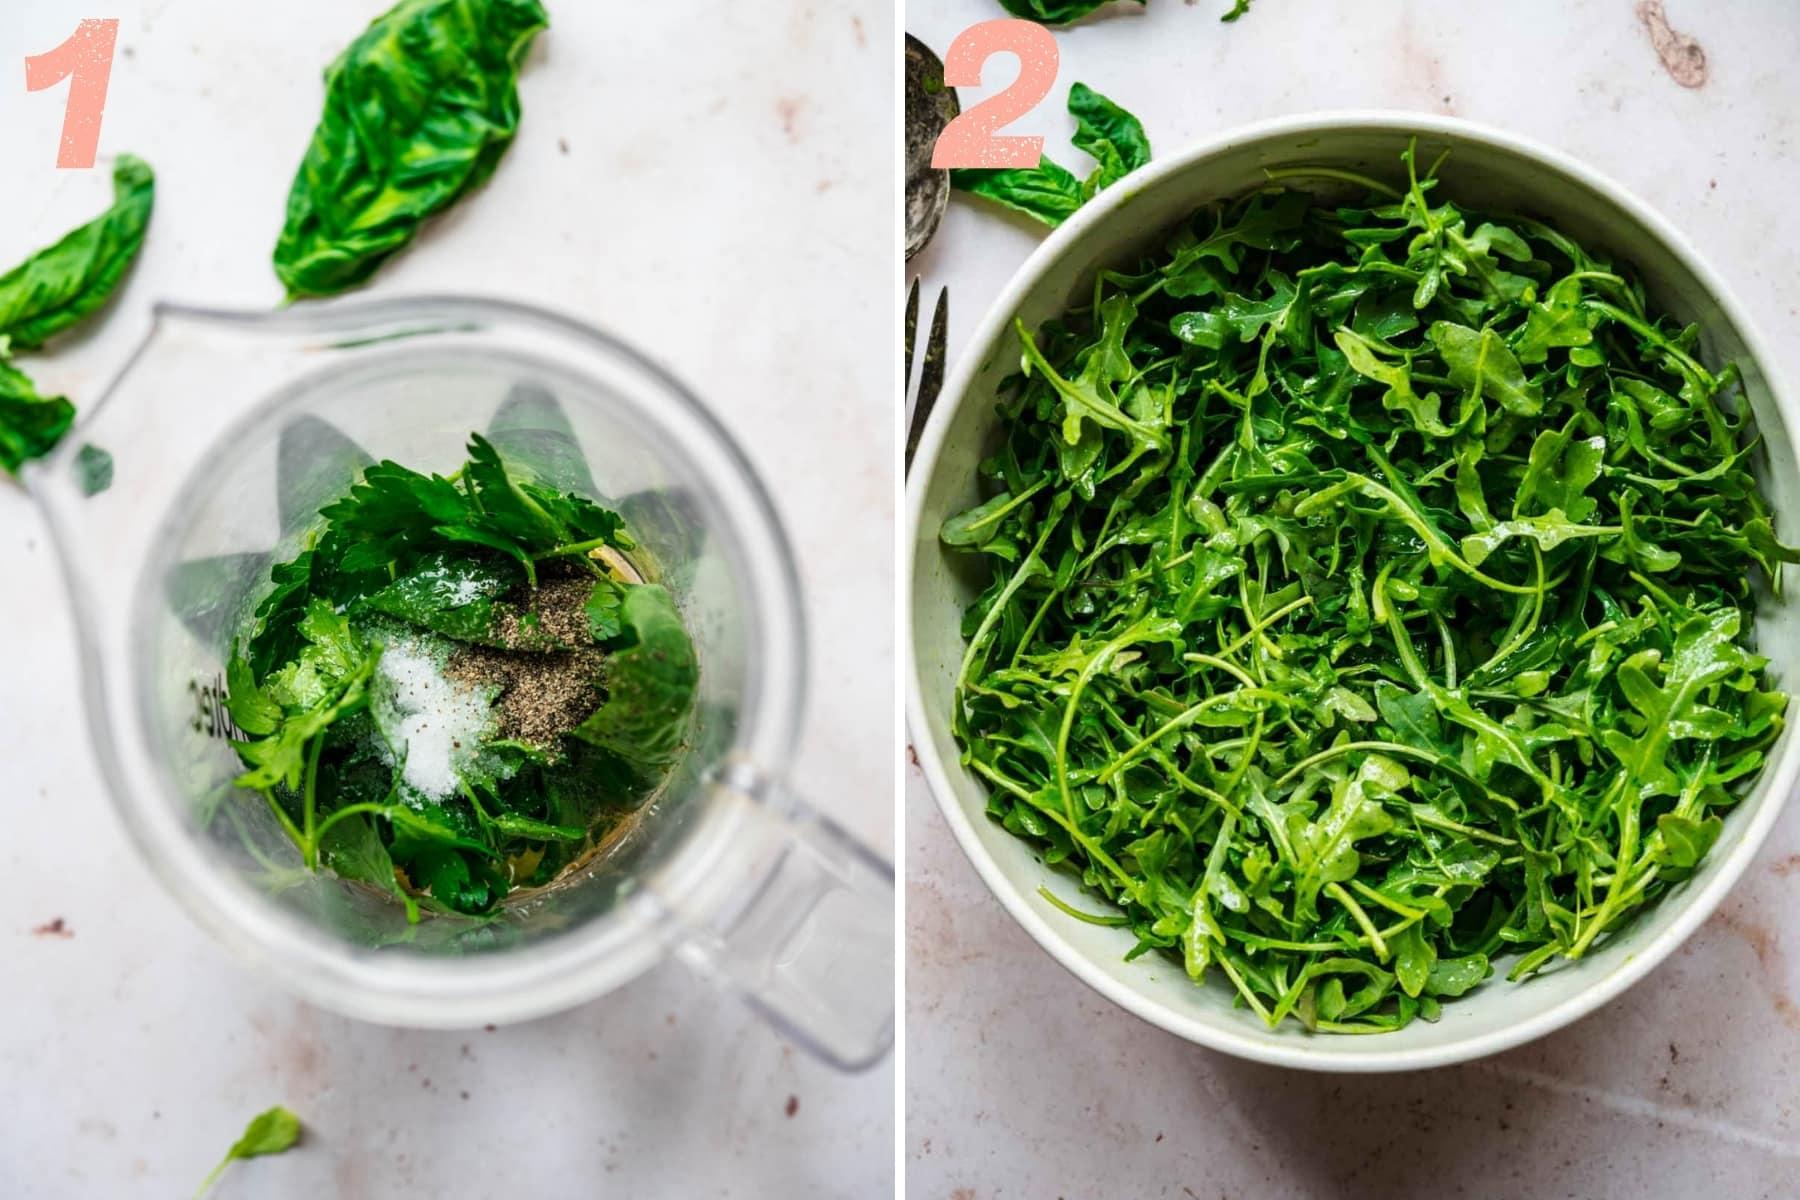 on the left: ingredients in blender to make basil vinaigrette. on the right: dressed arugula in large salad bowl.